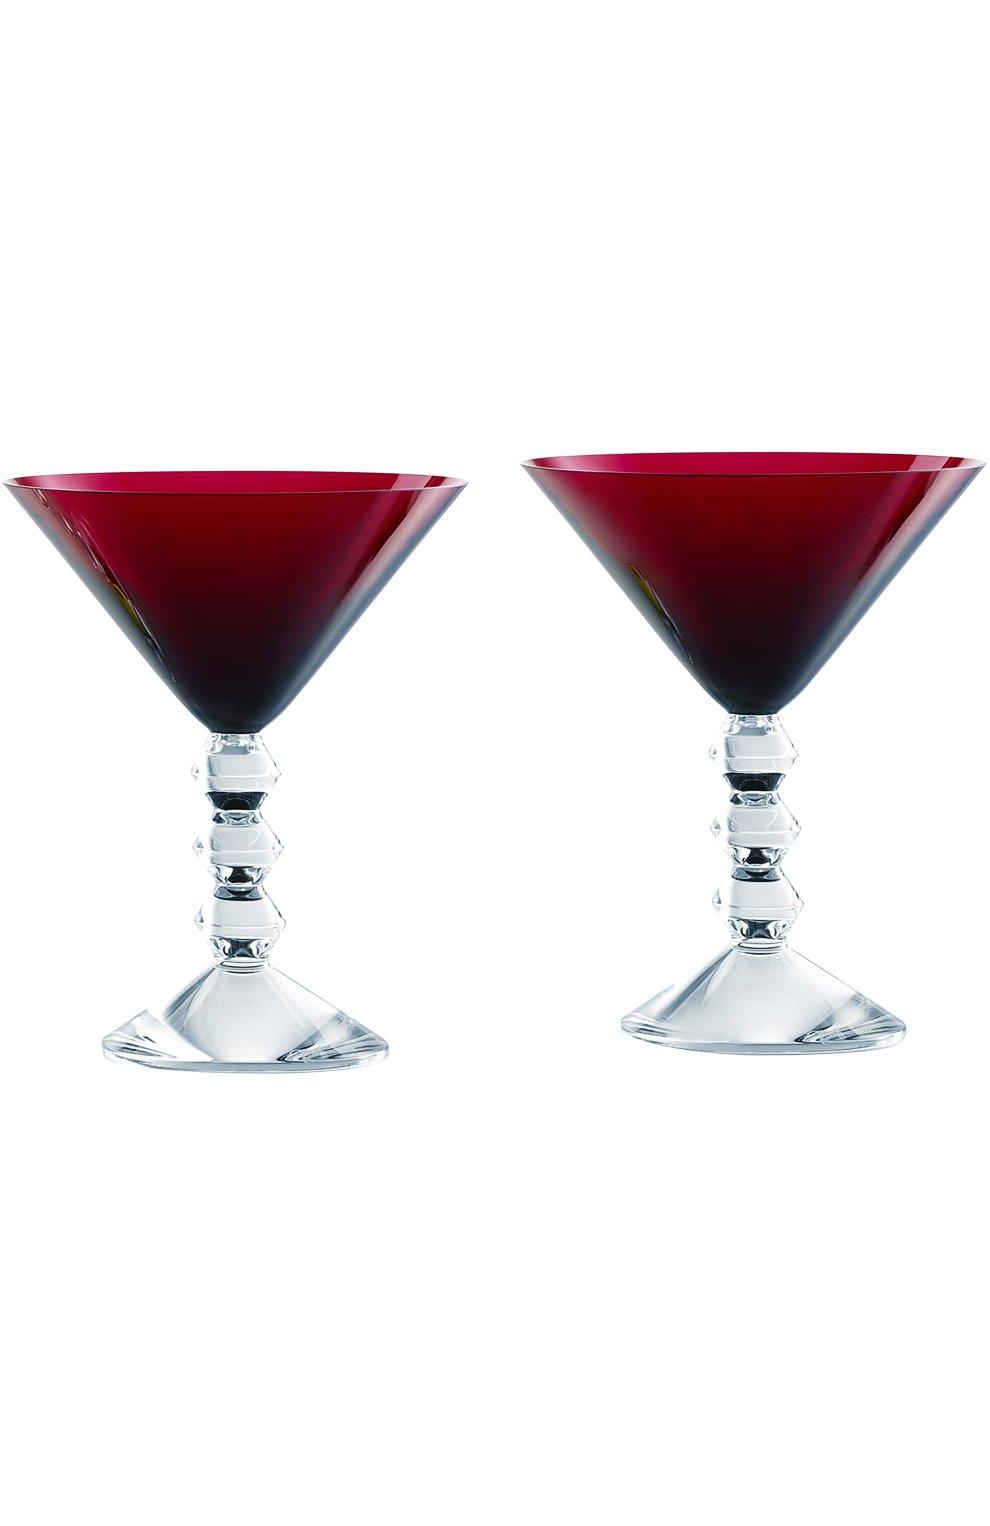 Мужского набор из 2-х бокалов для мартини vega BACCARAT красного цвета, арт. 2 810 900 | Фото 1